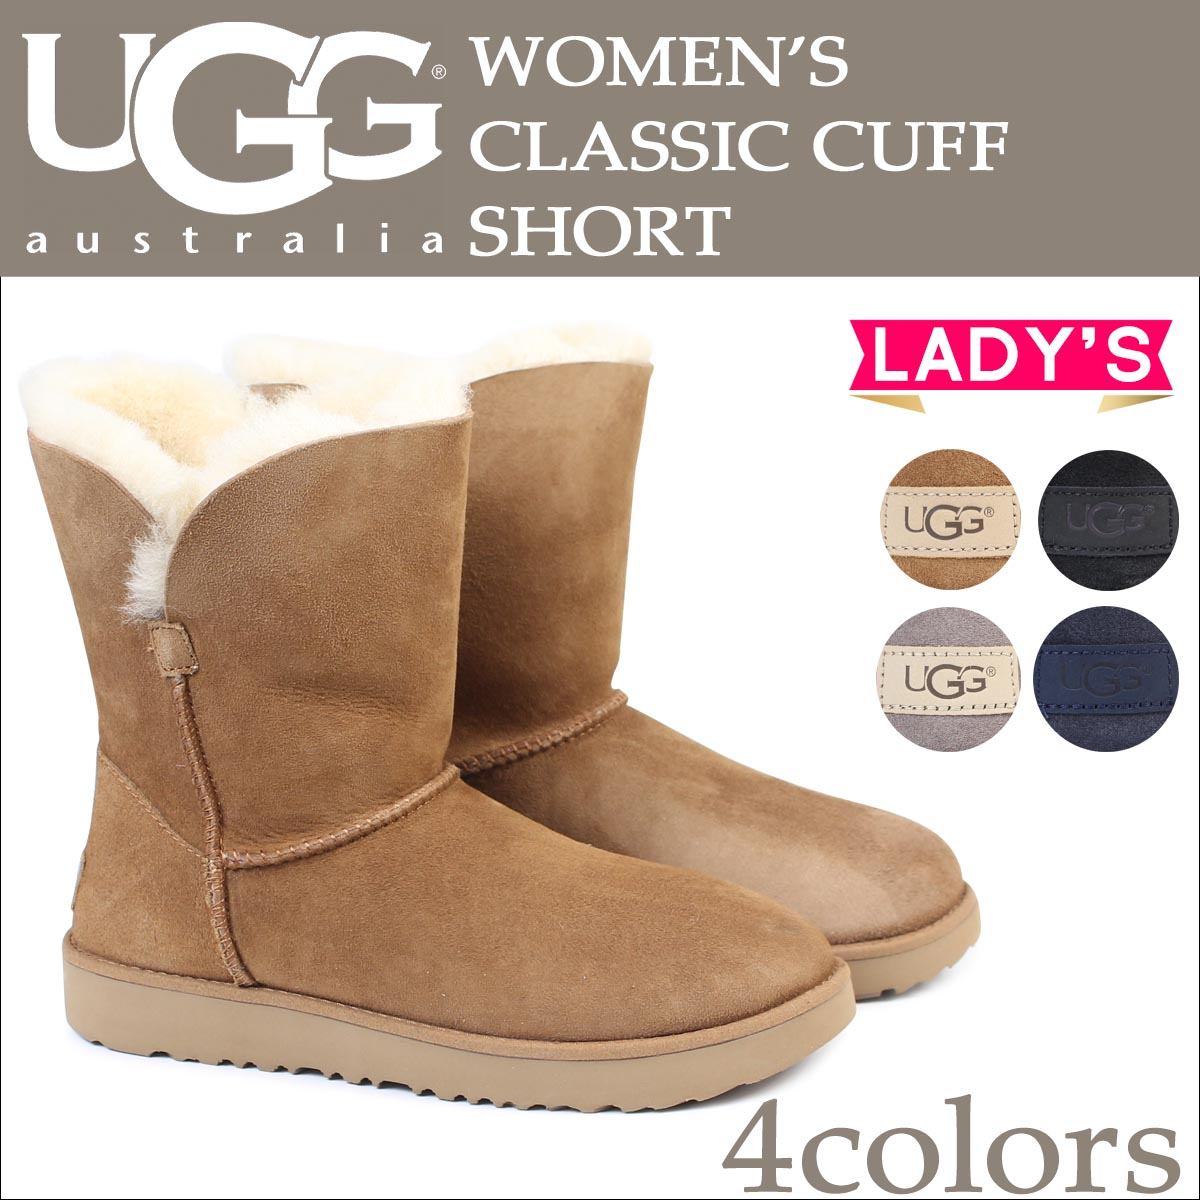 UGG Classic Cuff Short Boot, Women